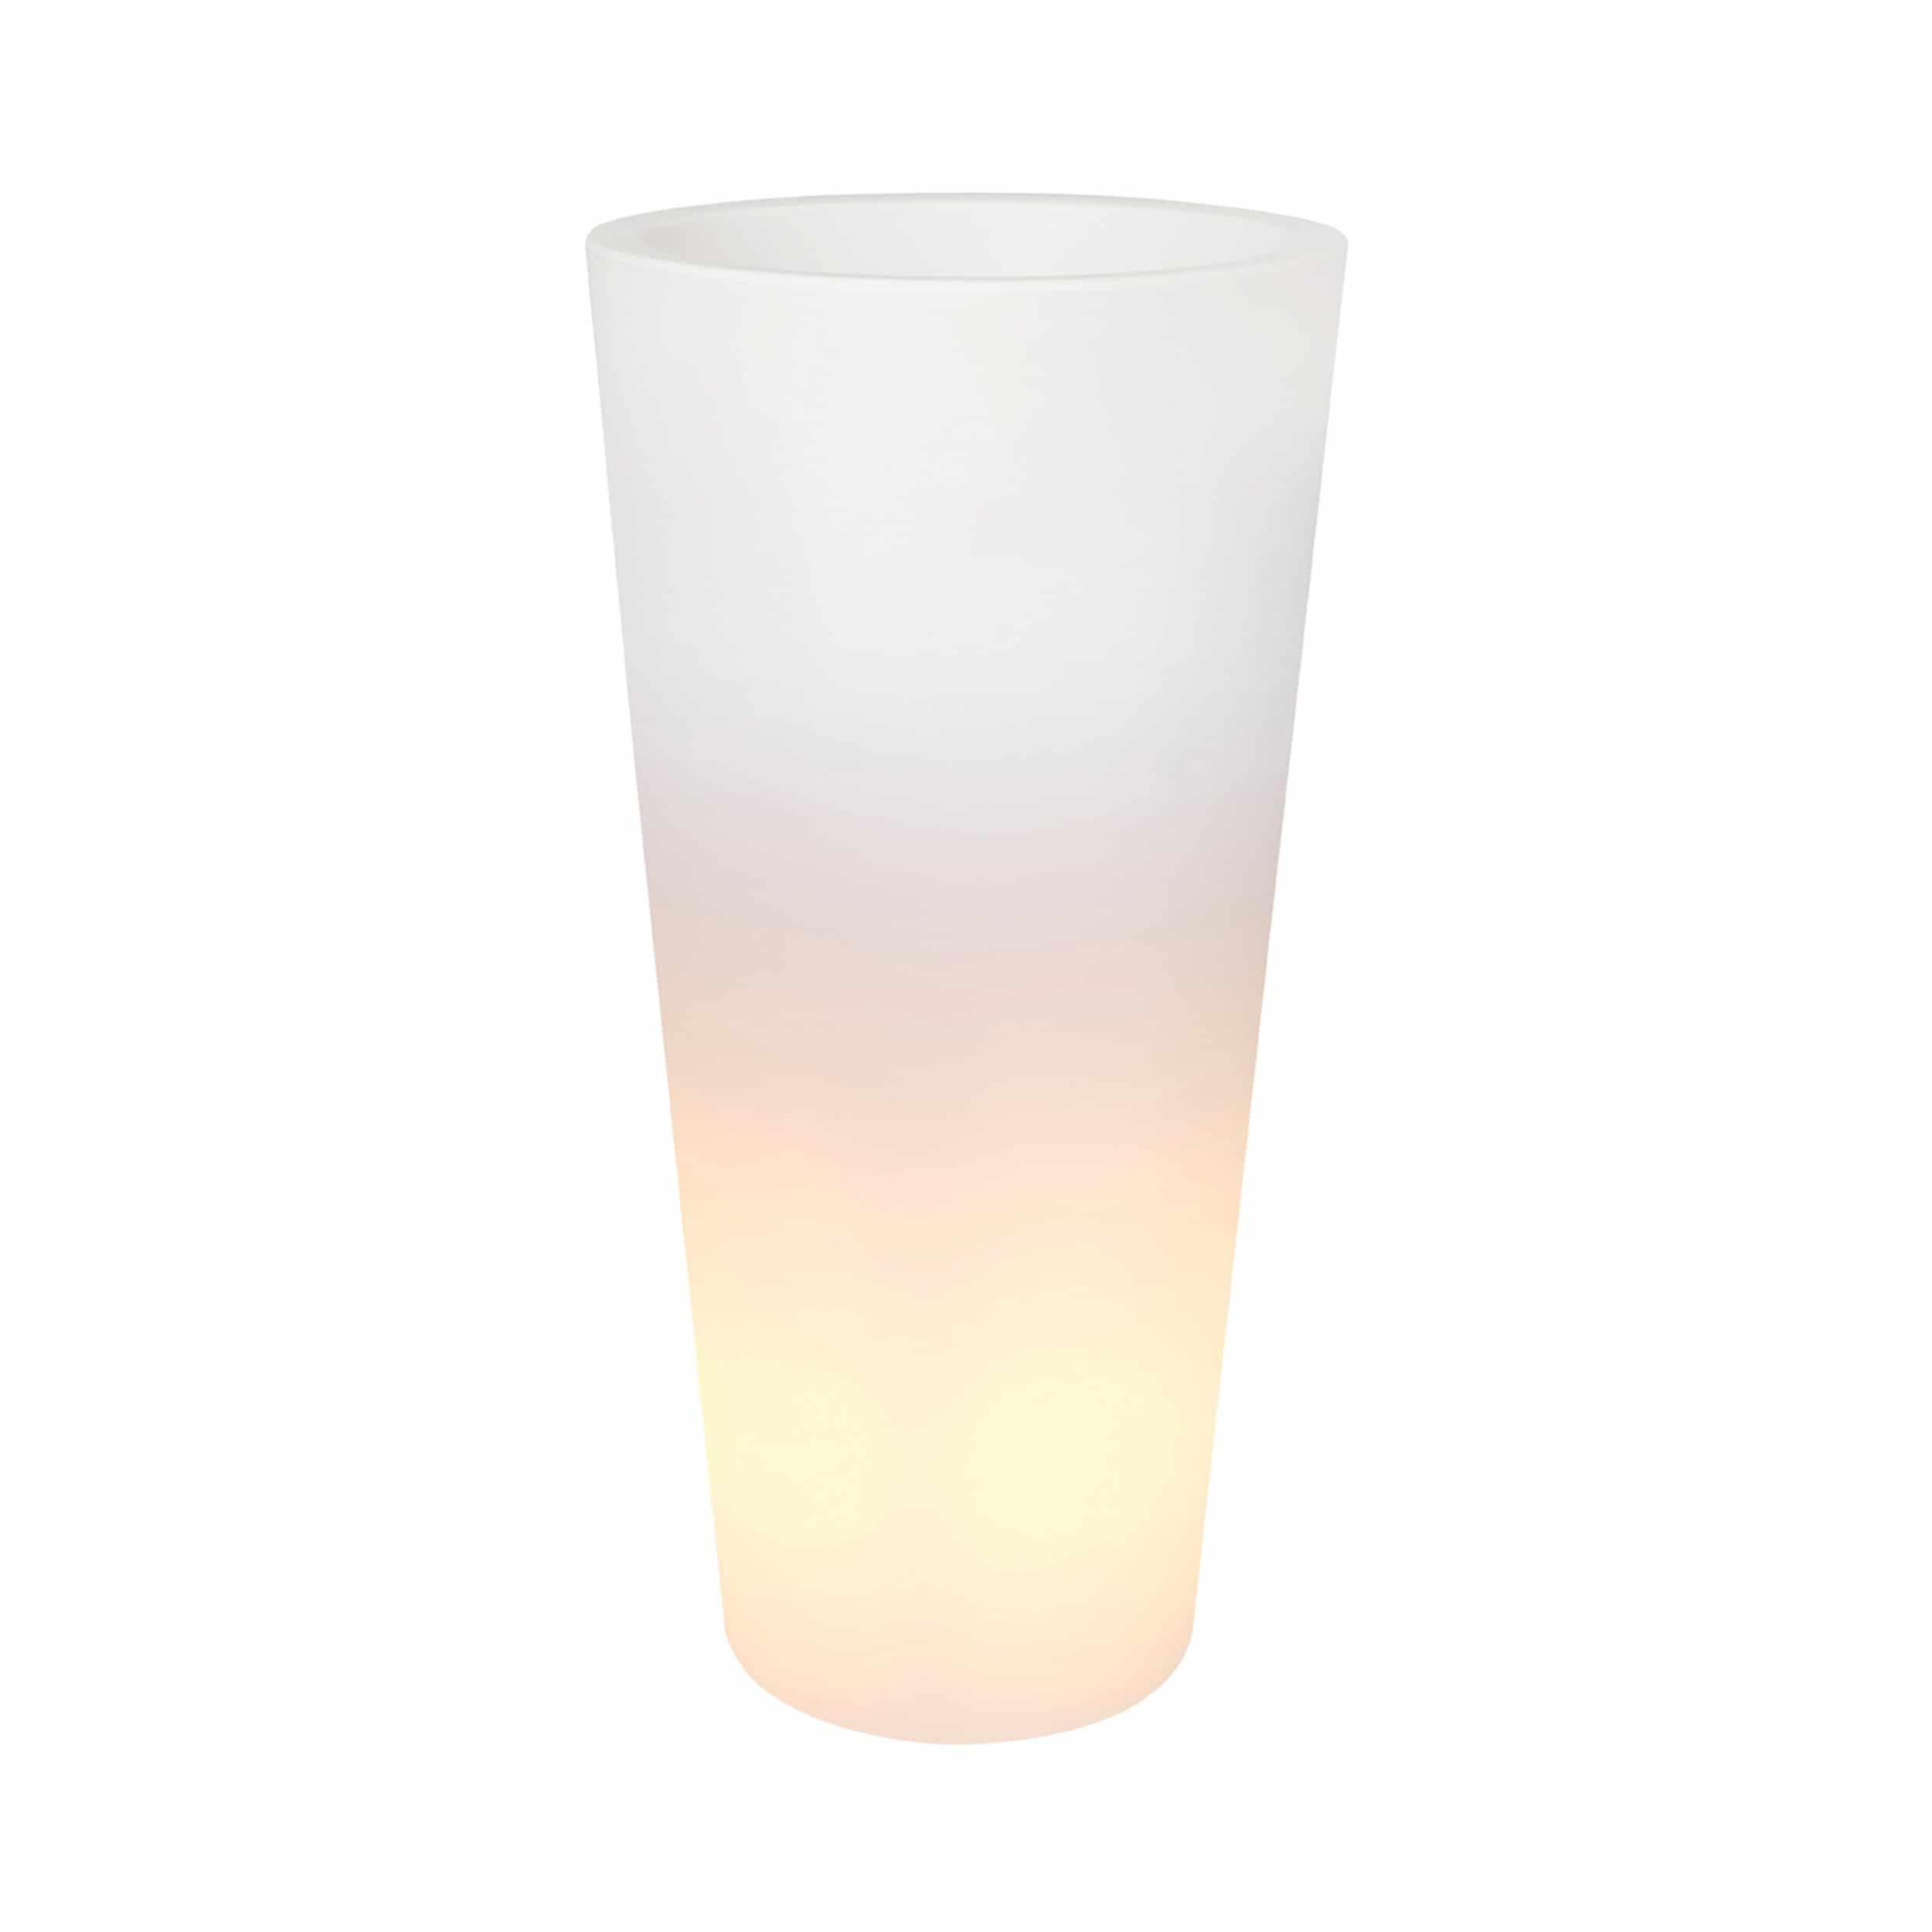 Pflanzsäule beleuchtet Pure Straight High LED Light D50cm